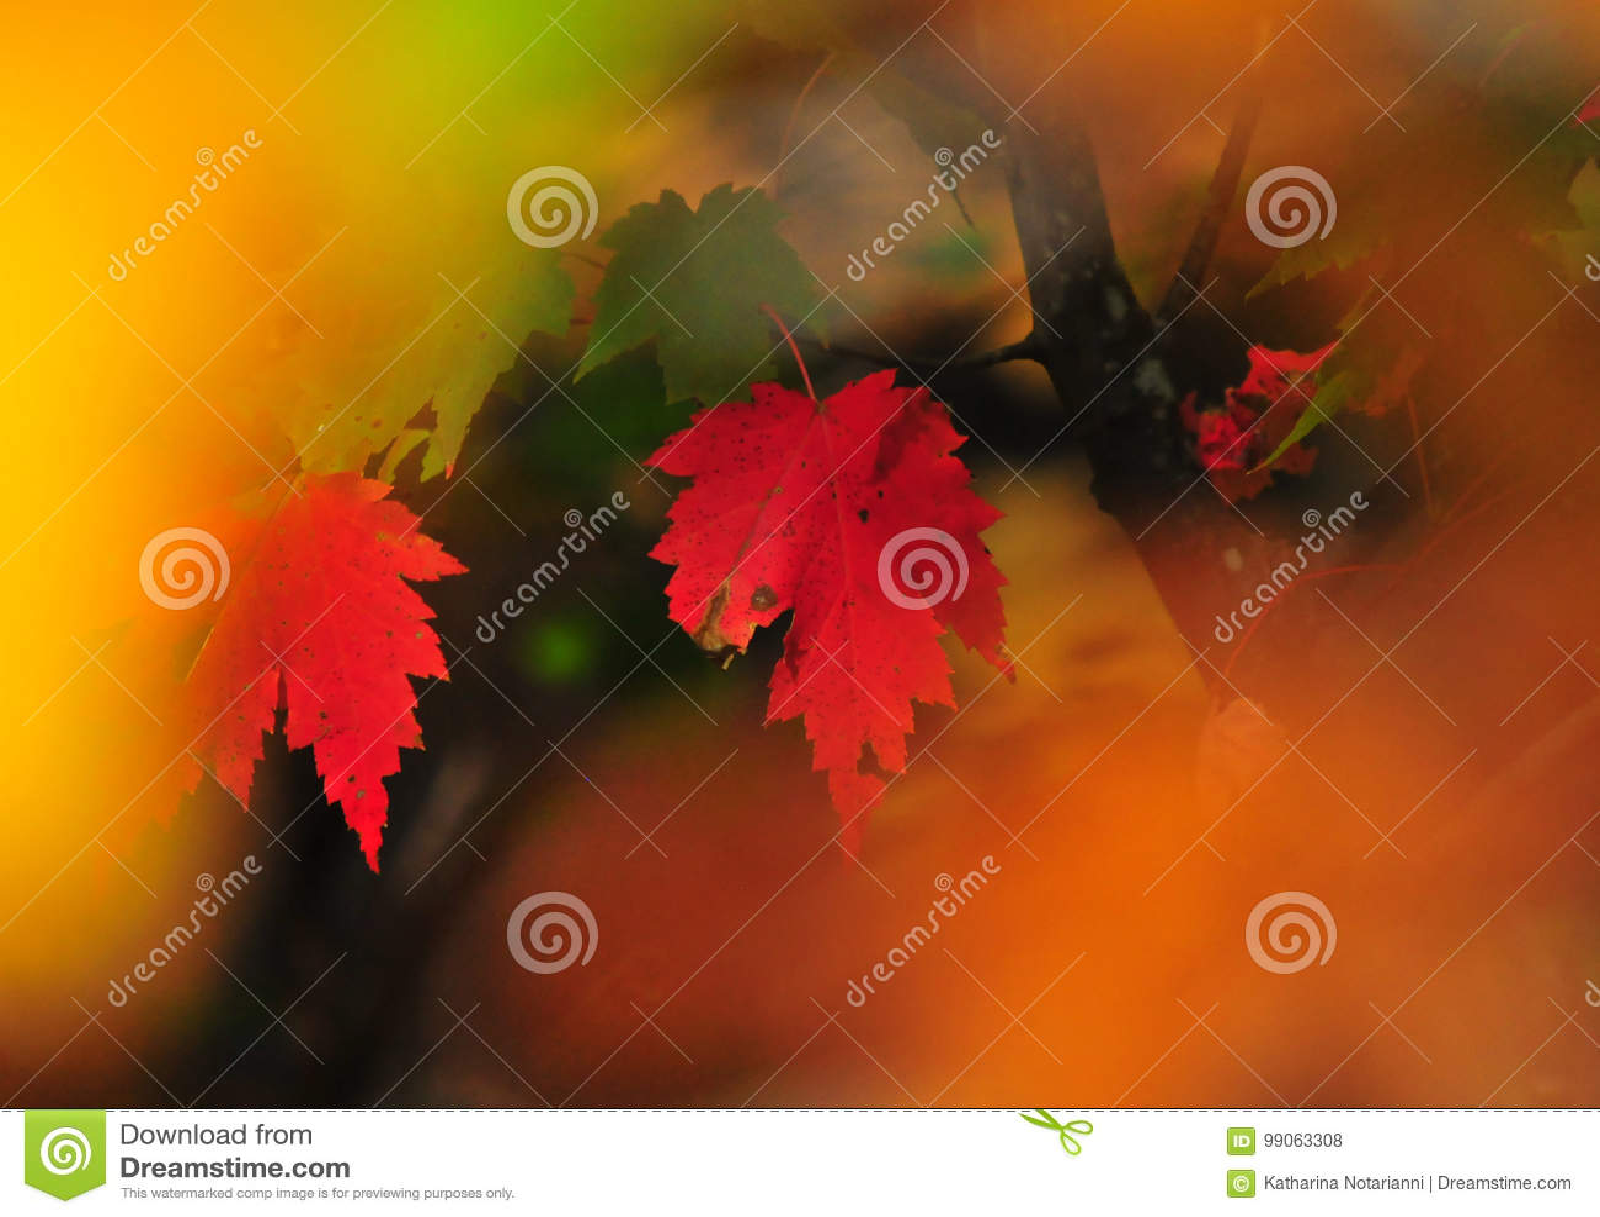 Fall Foliage Autumn Leaves Close Up Background